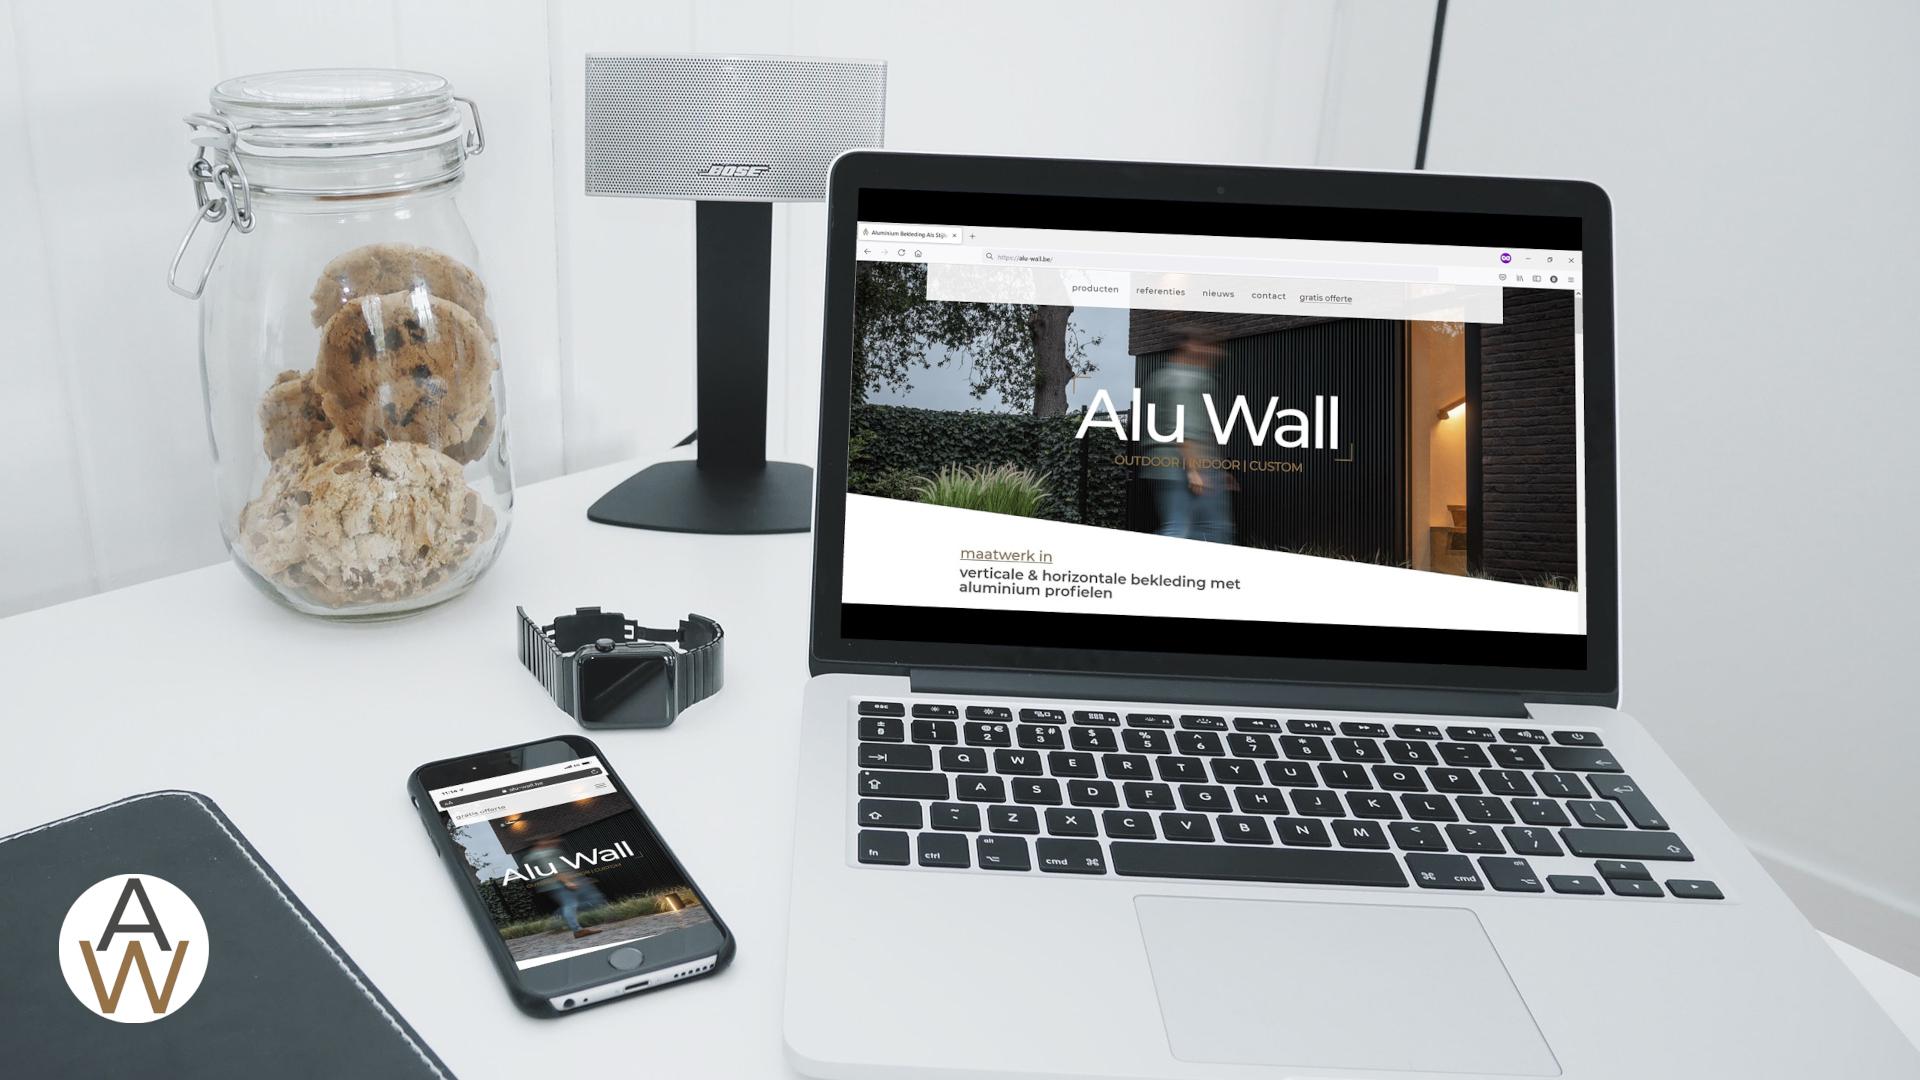 Alu Wall website live